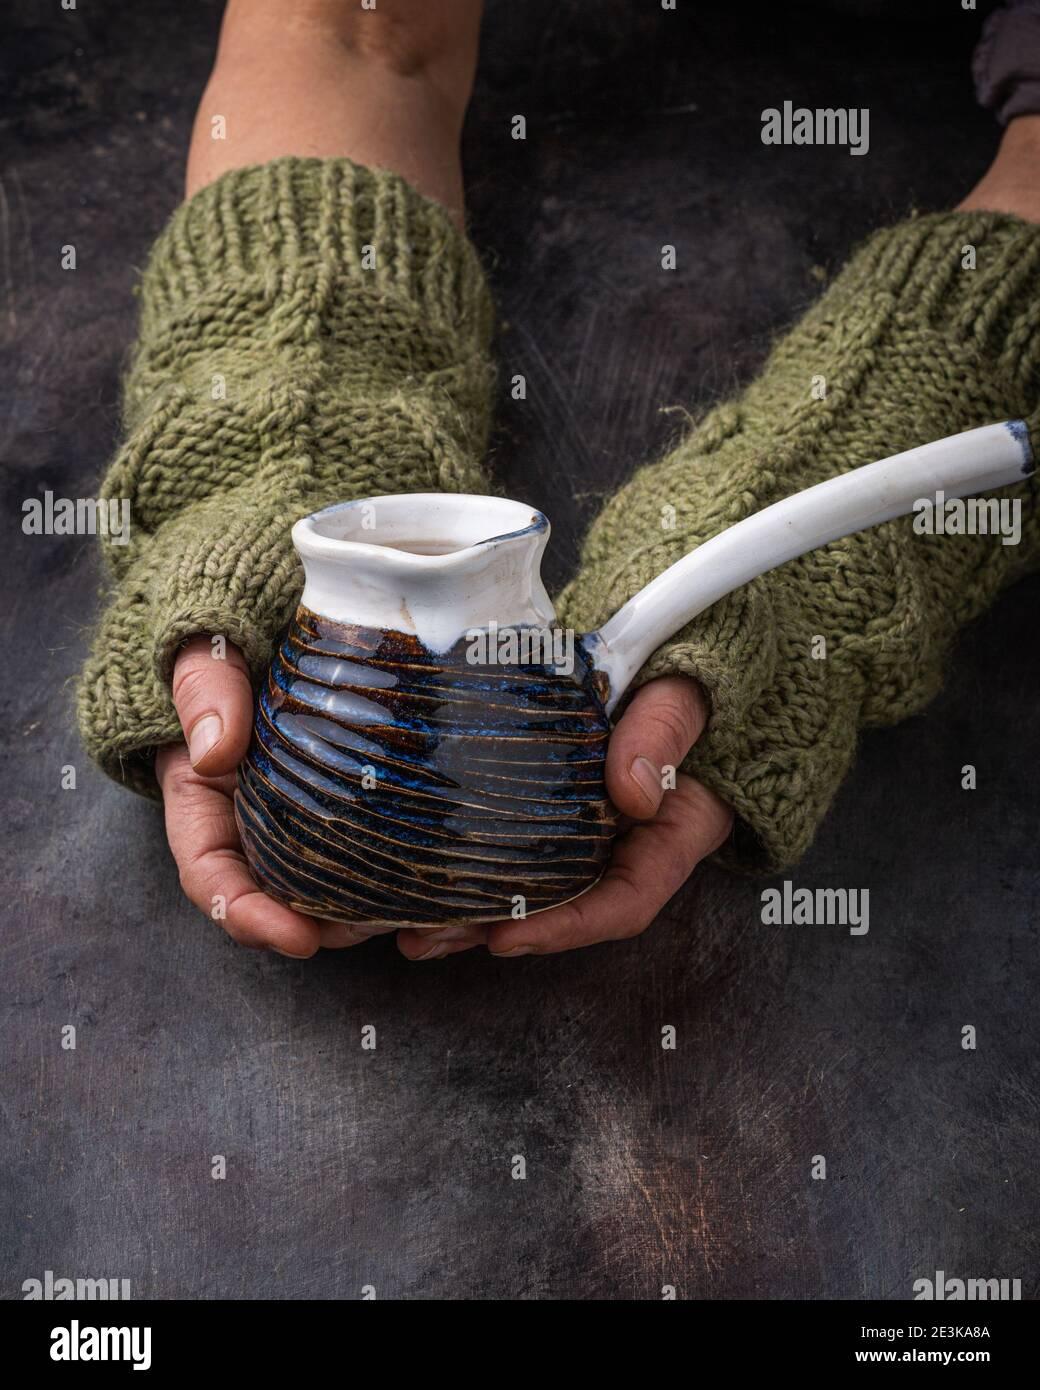 Taza hecha a mano en manos femeninas, foto oscura. Foto de stock